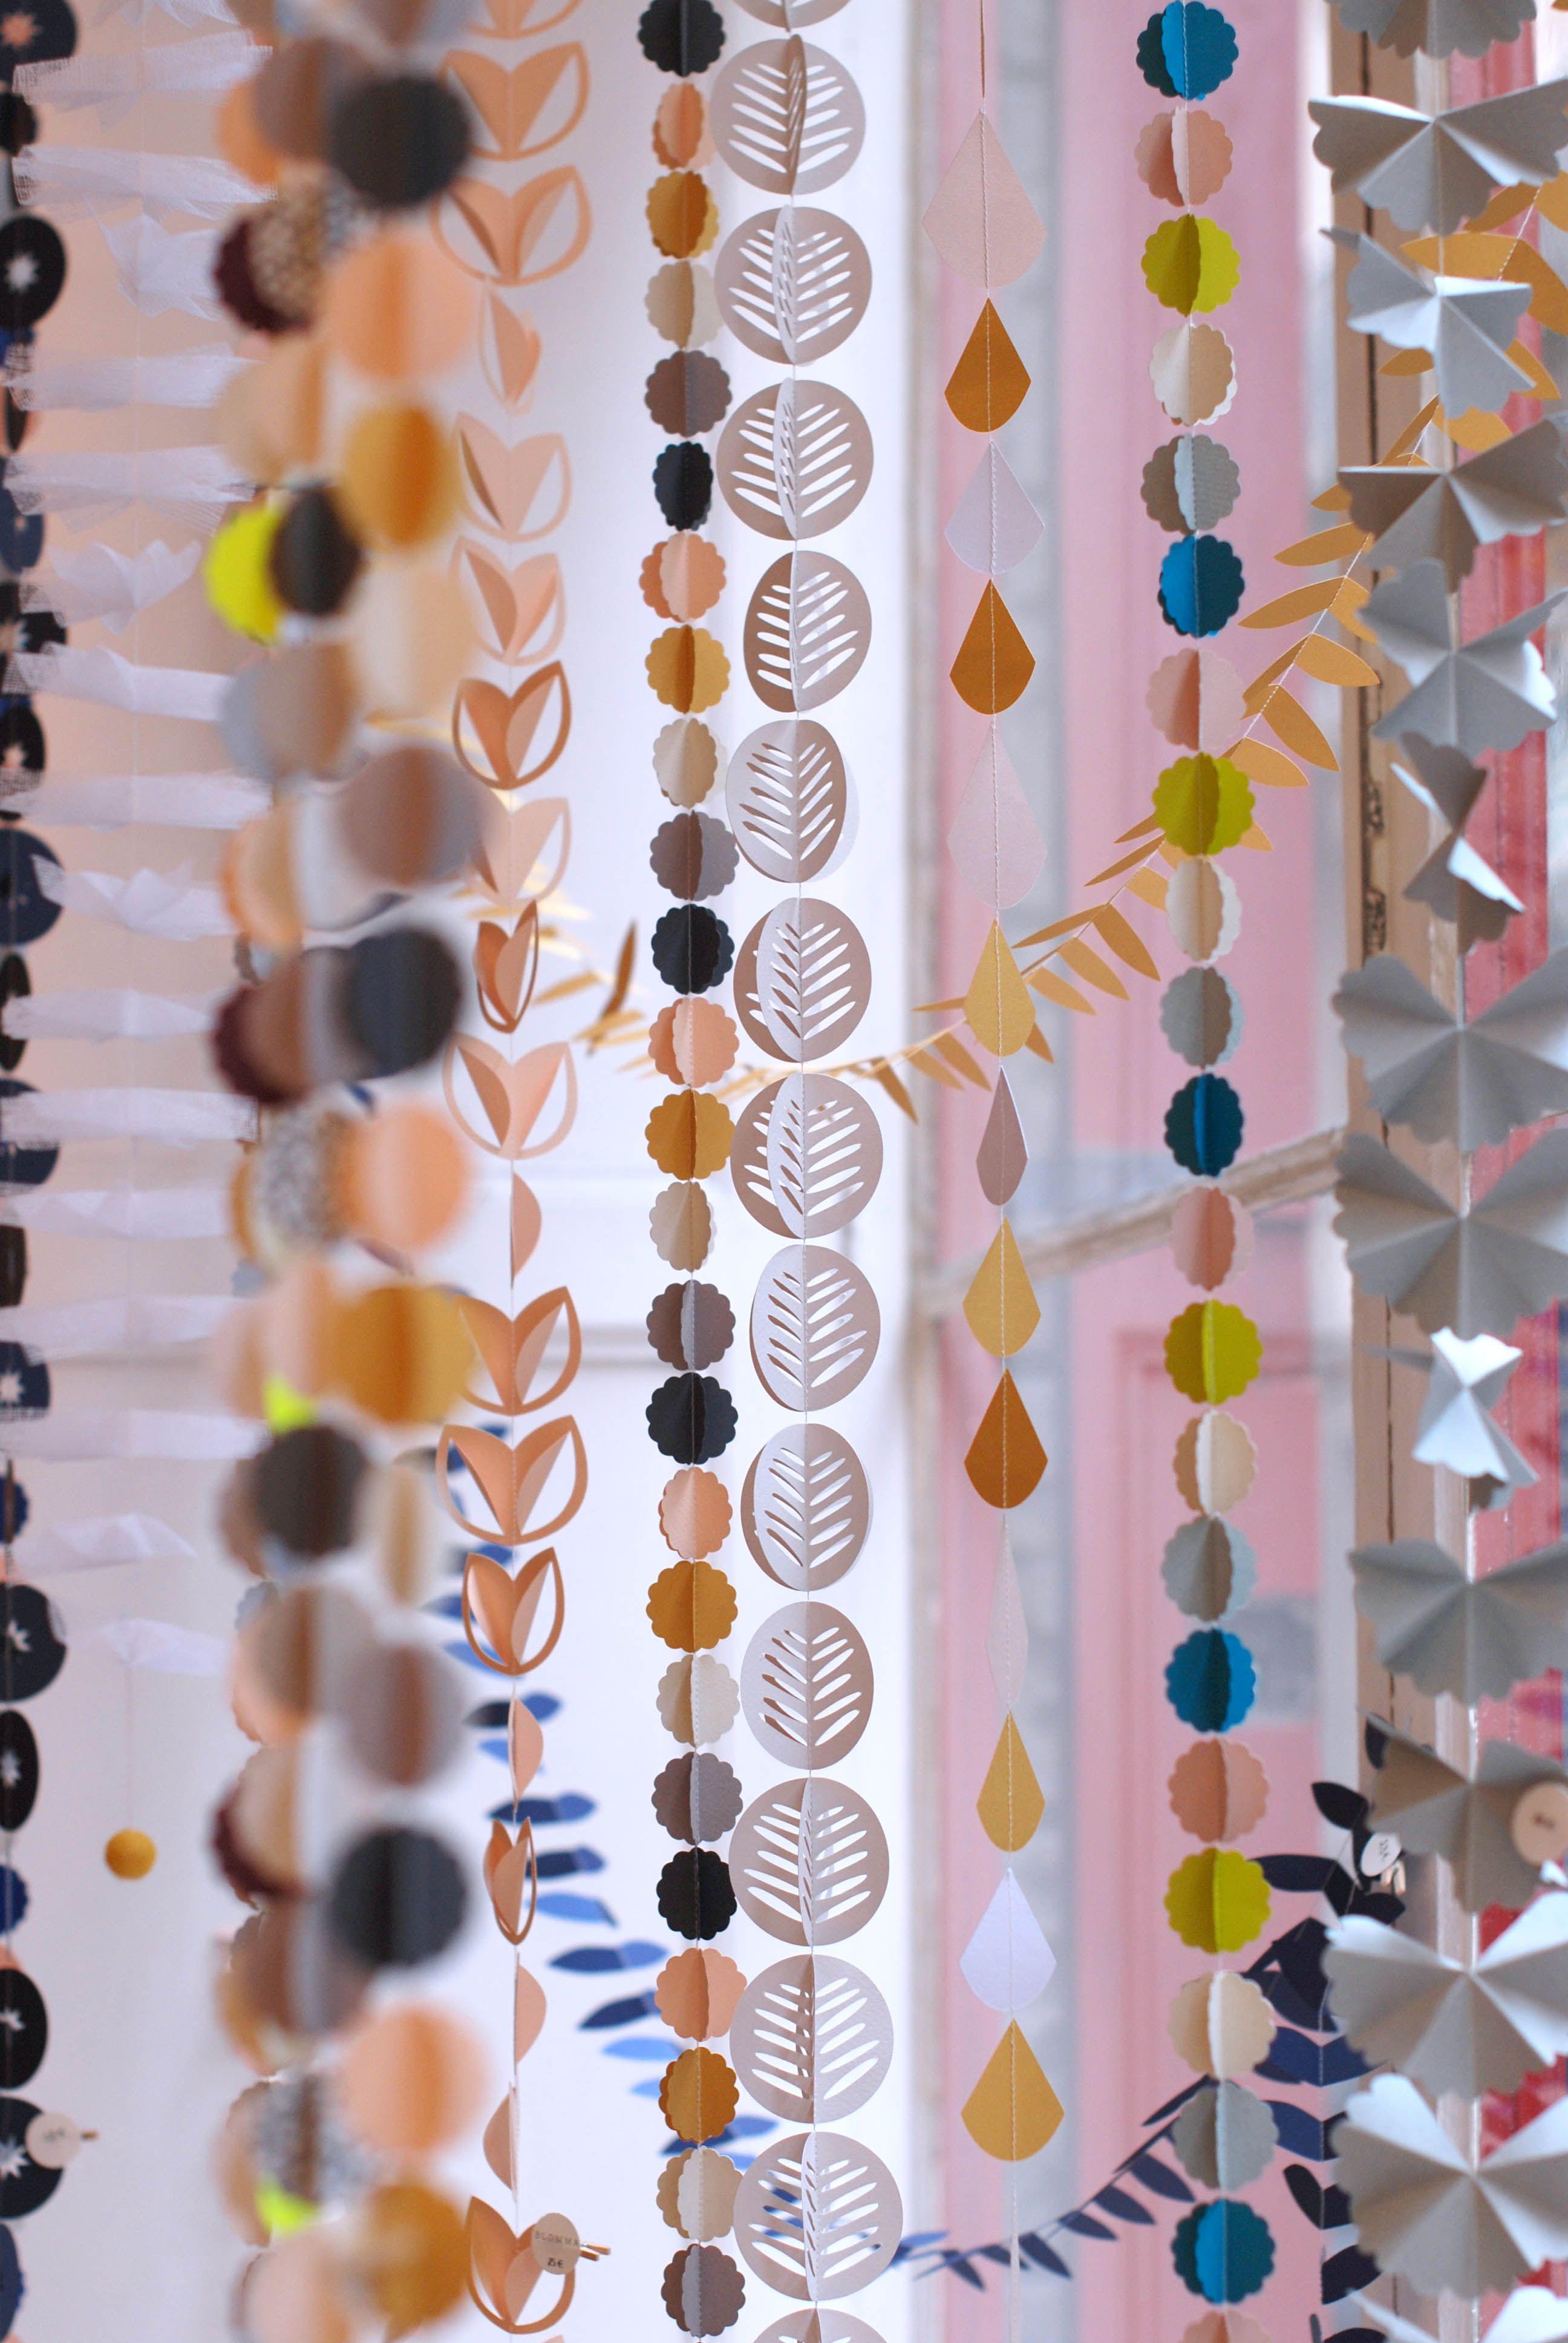 guirlandes en papier Miavril / handmade paper garlands by